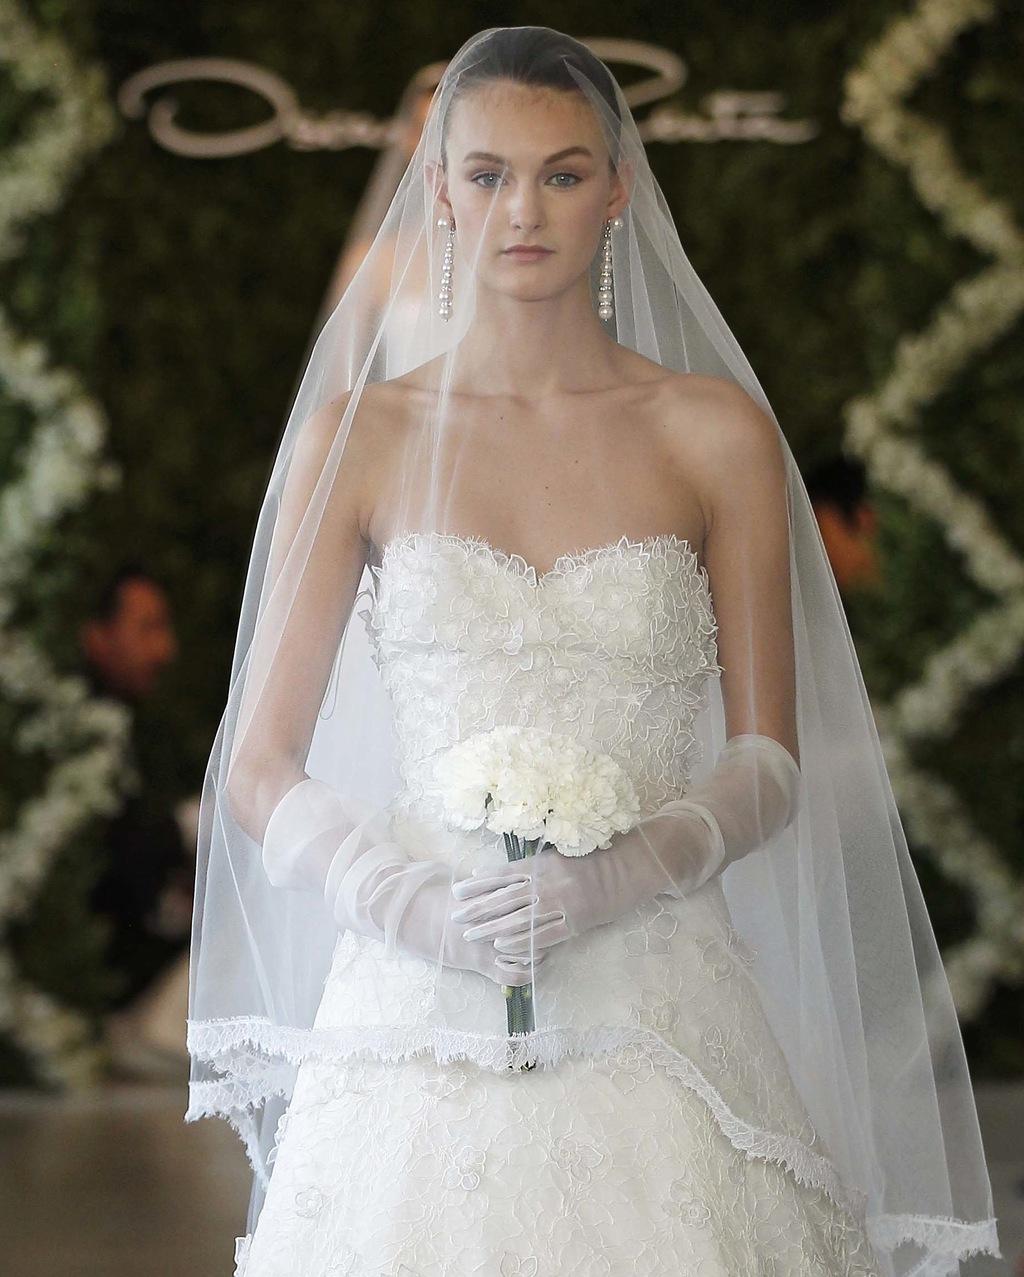 Gorgeous-lace-wedding-dress-oscar-de-la-renta-spring-2013.full